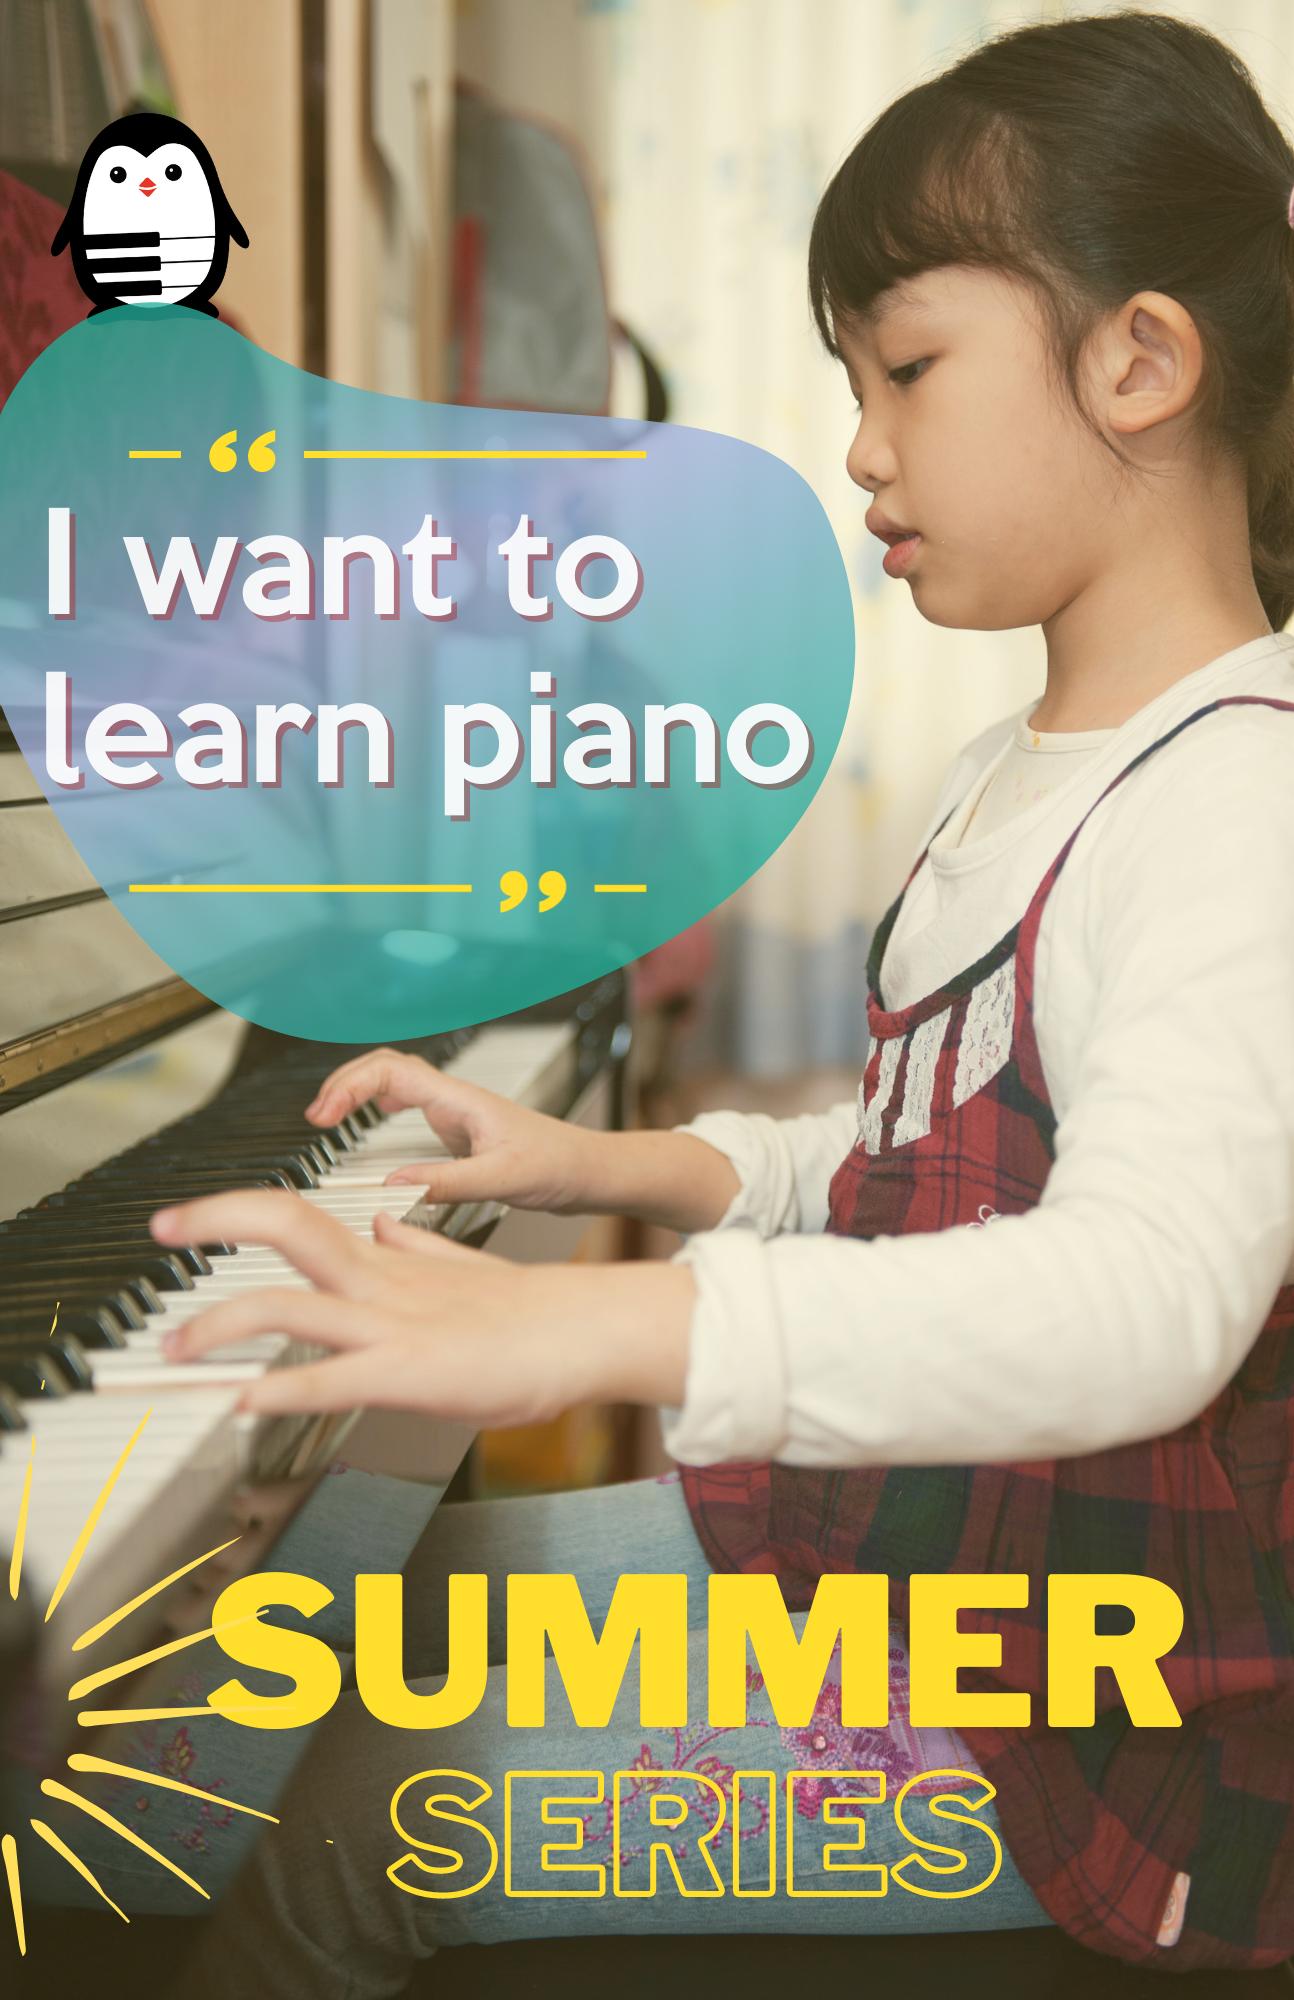 Summer Piano Lessons in Frisco Plano